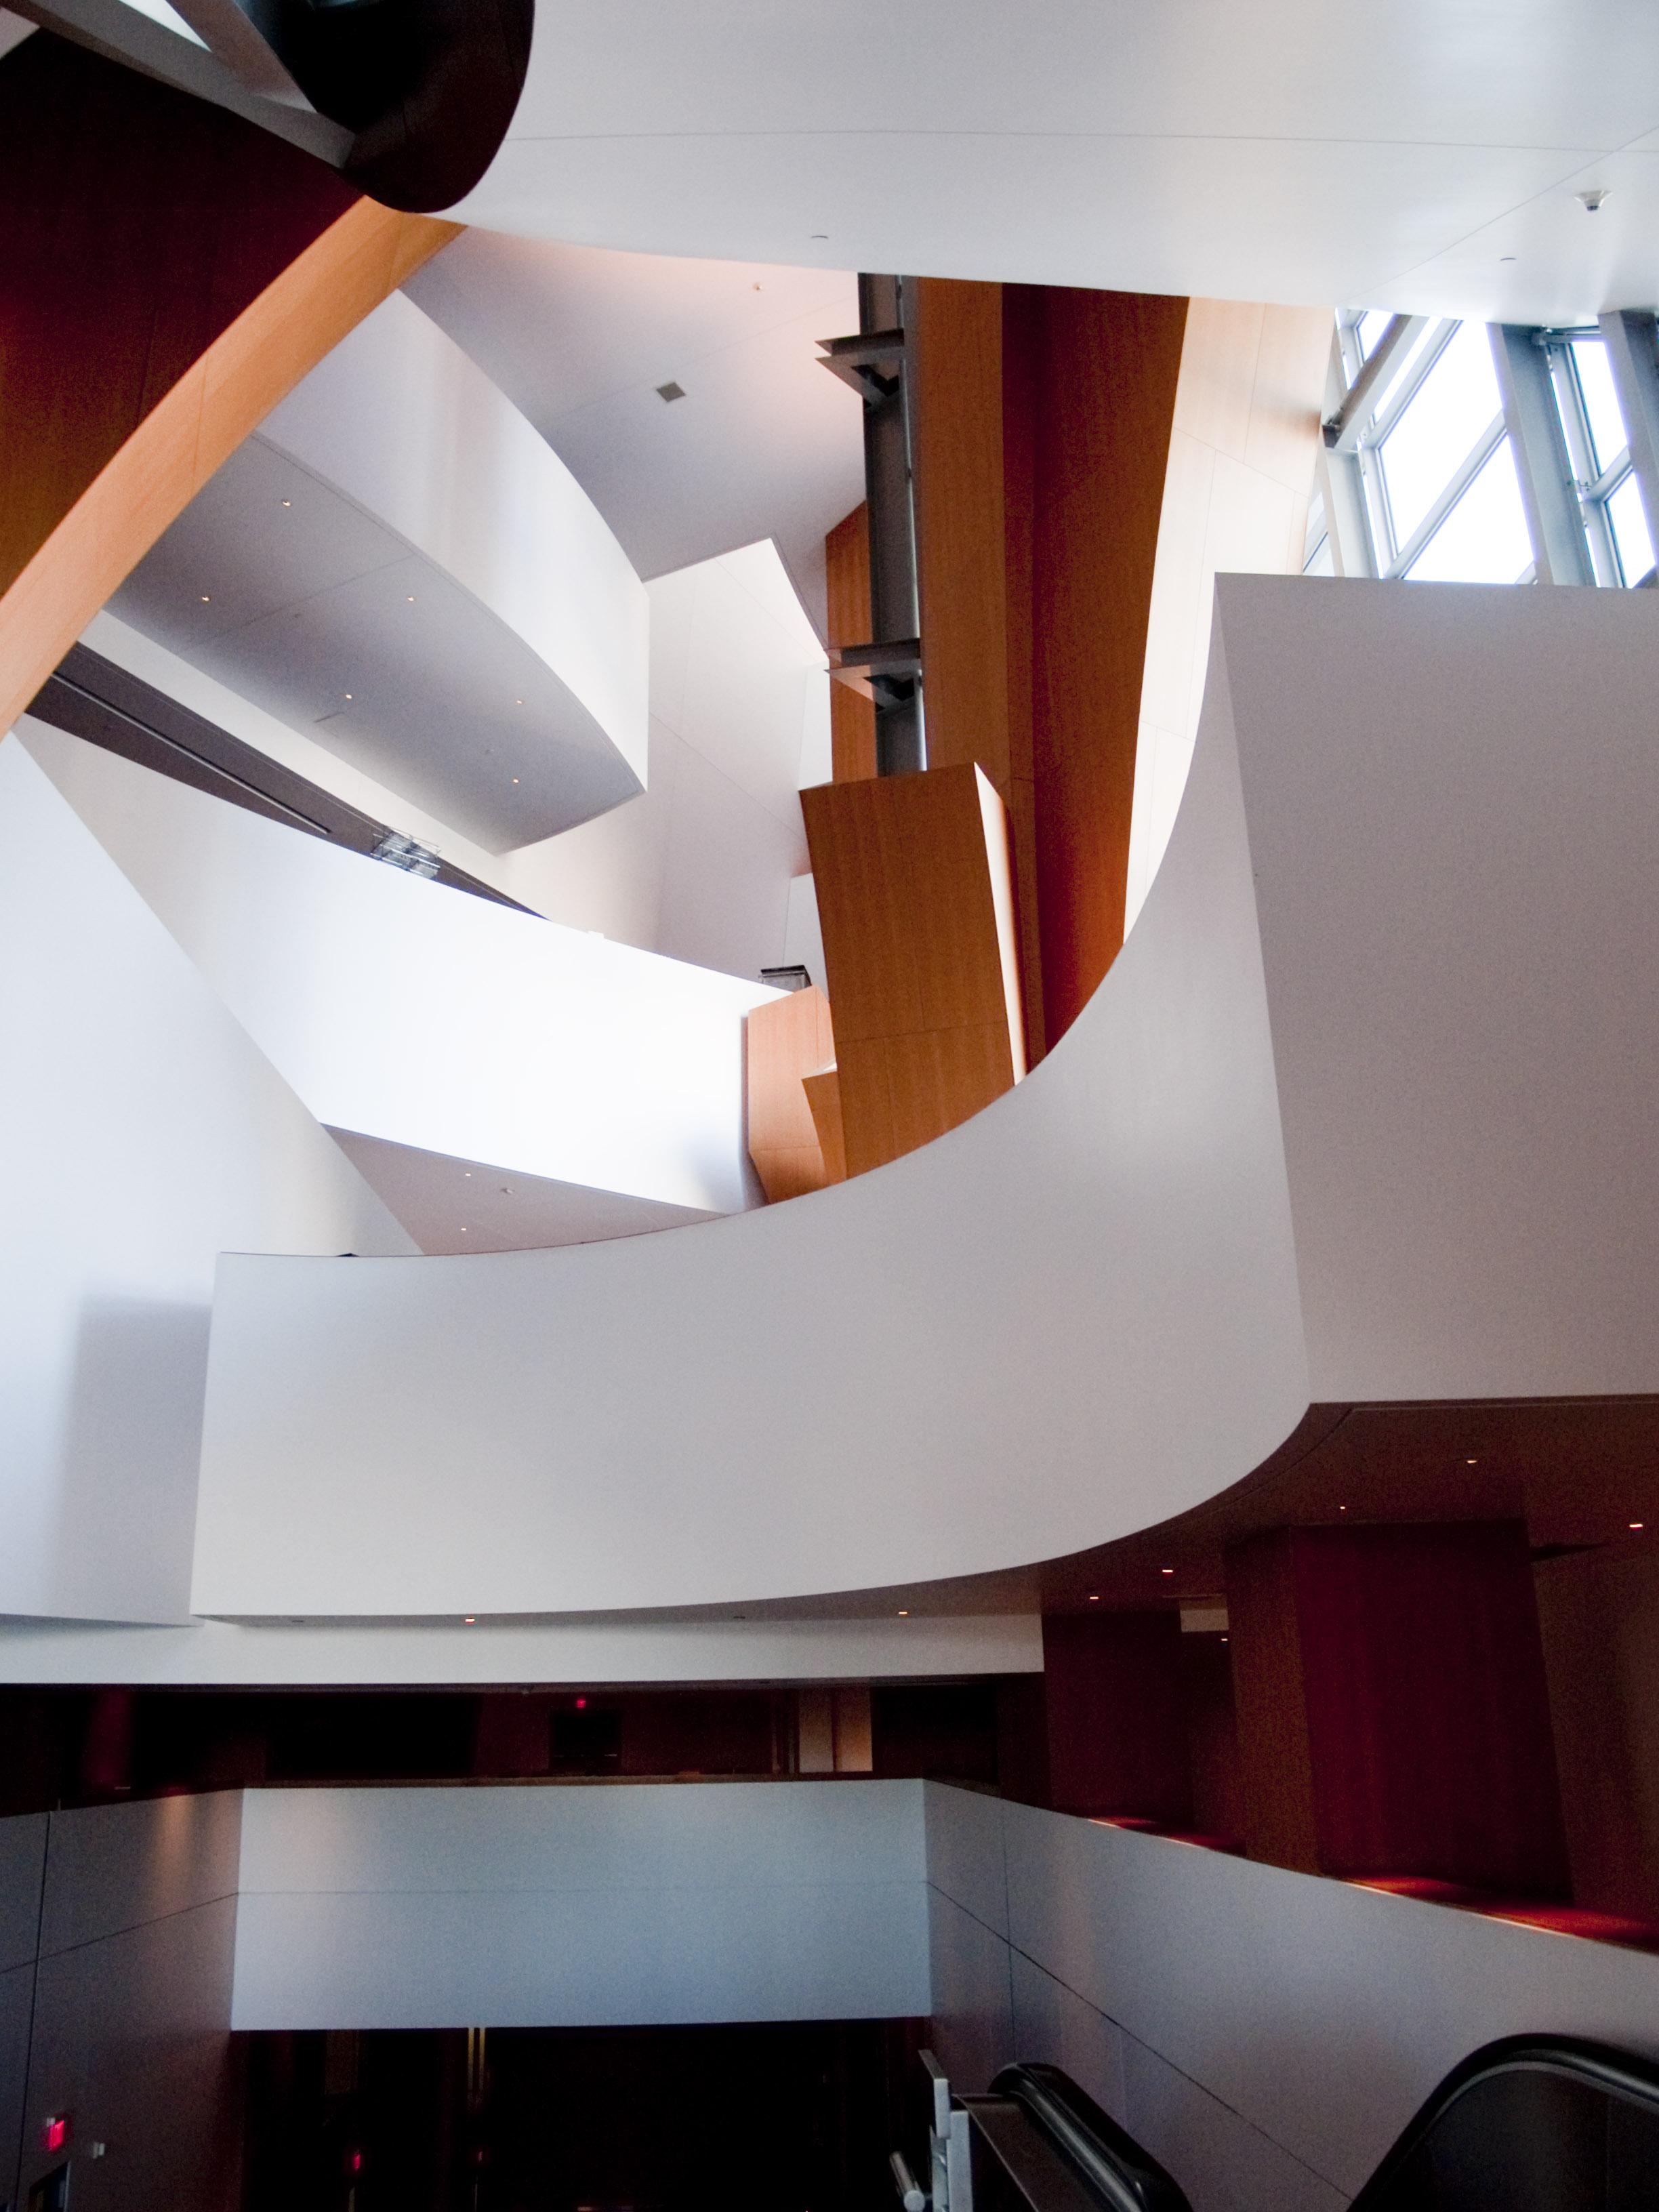 Archikey Com Buildings The Walt Disney Concert Hall